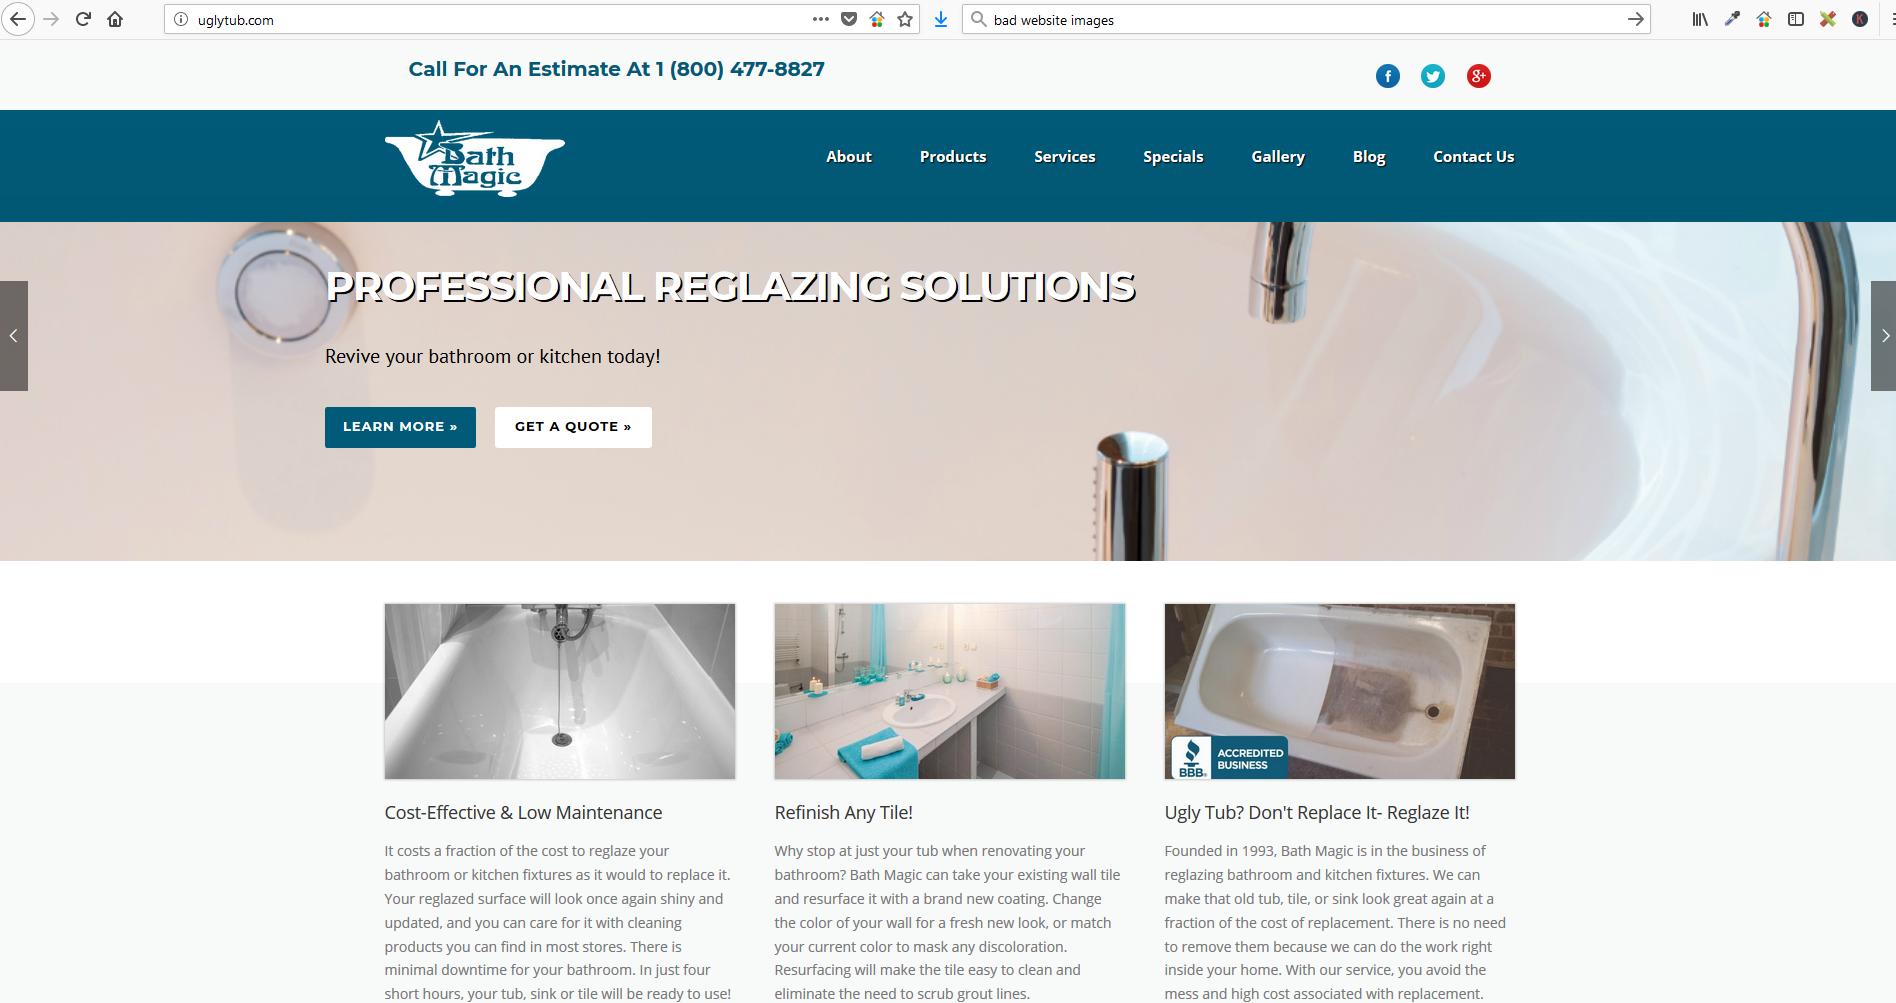 Bath Magic, Inc. website after screenshot